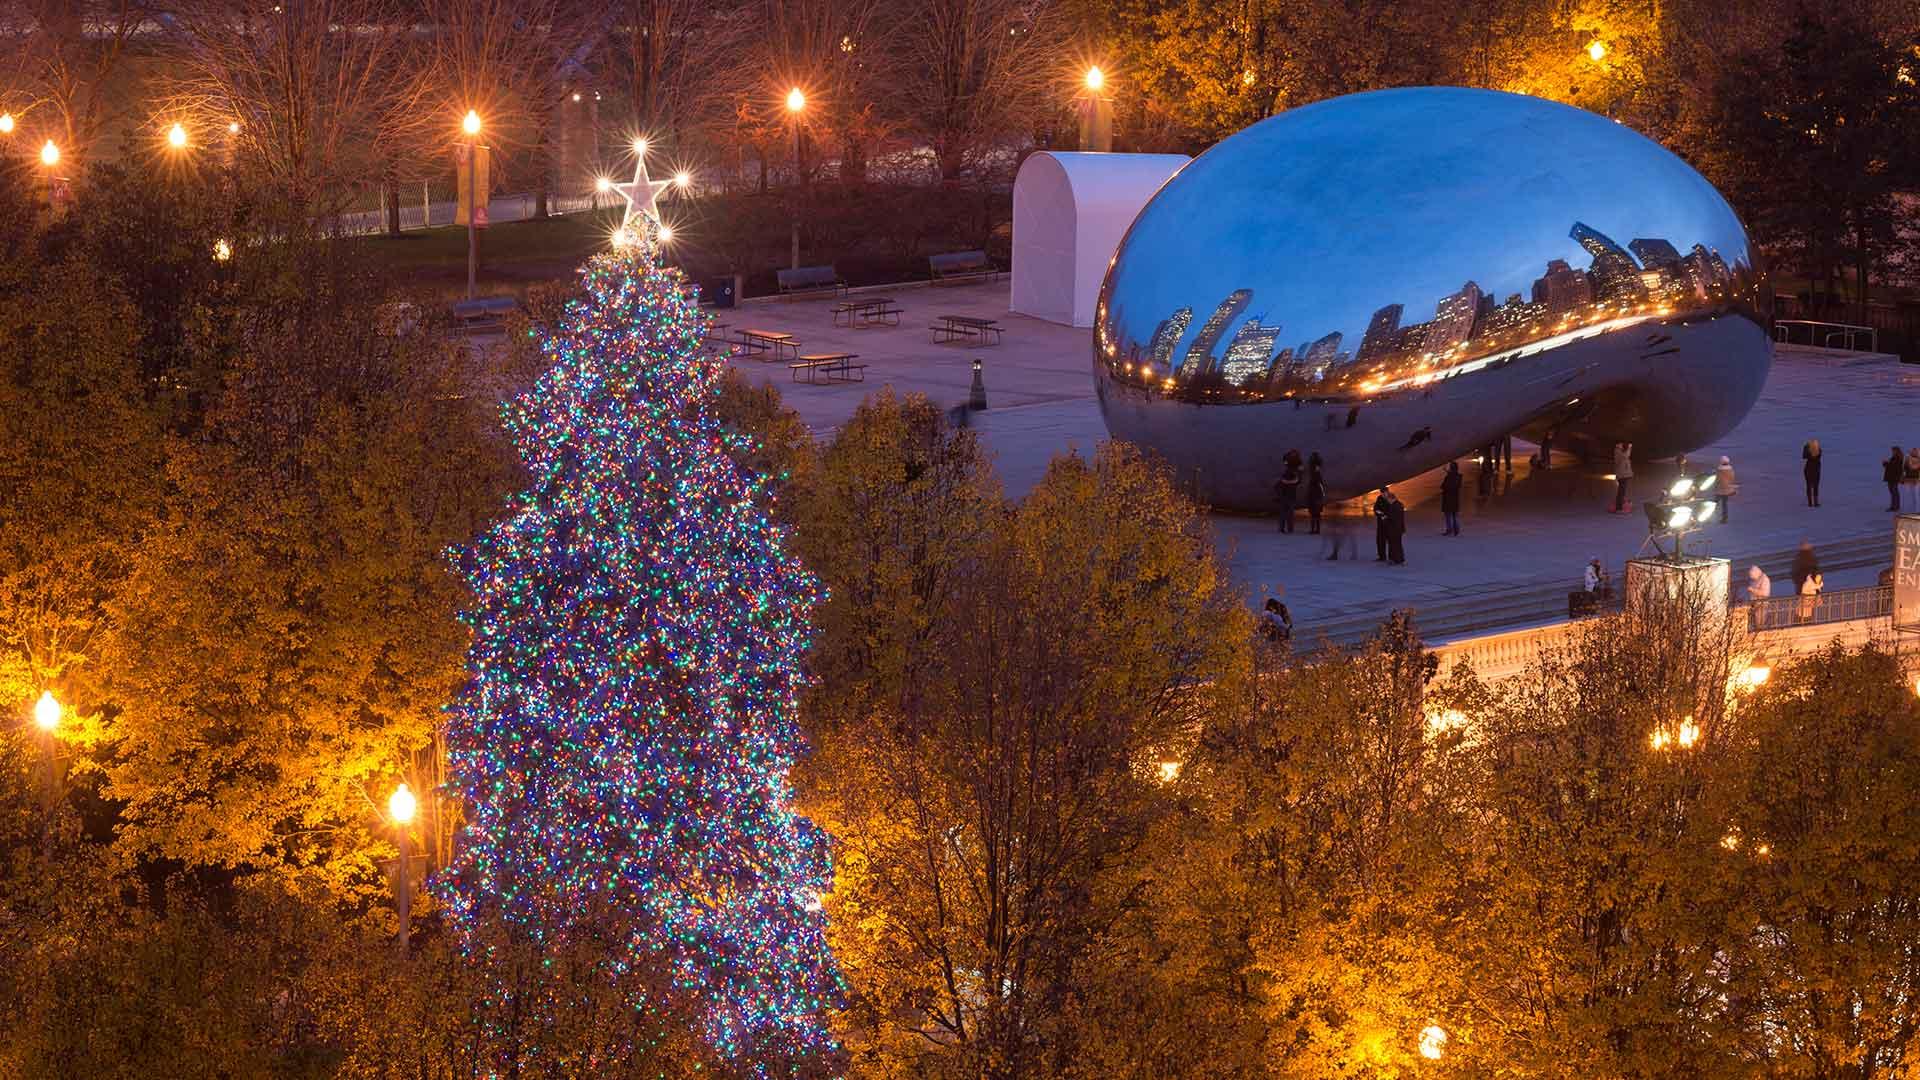 Holidays at Millennium Park in Chicago.